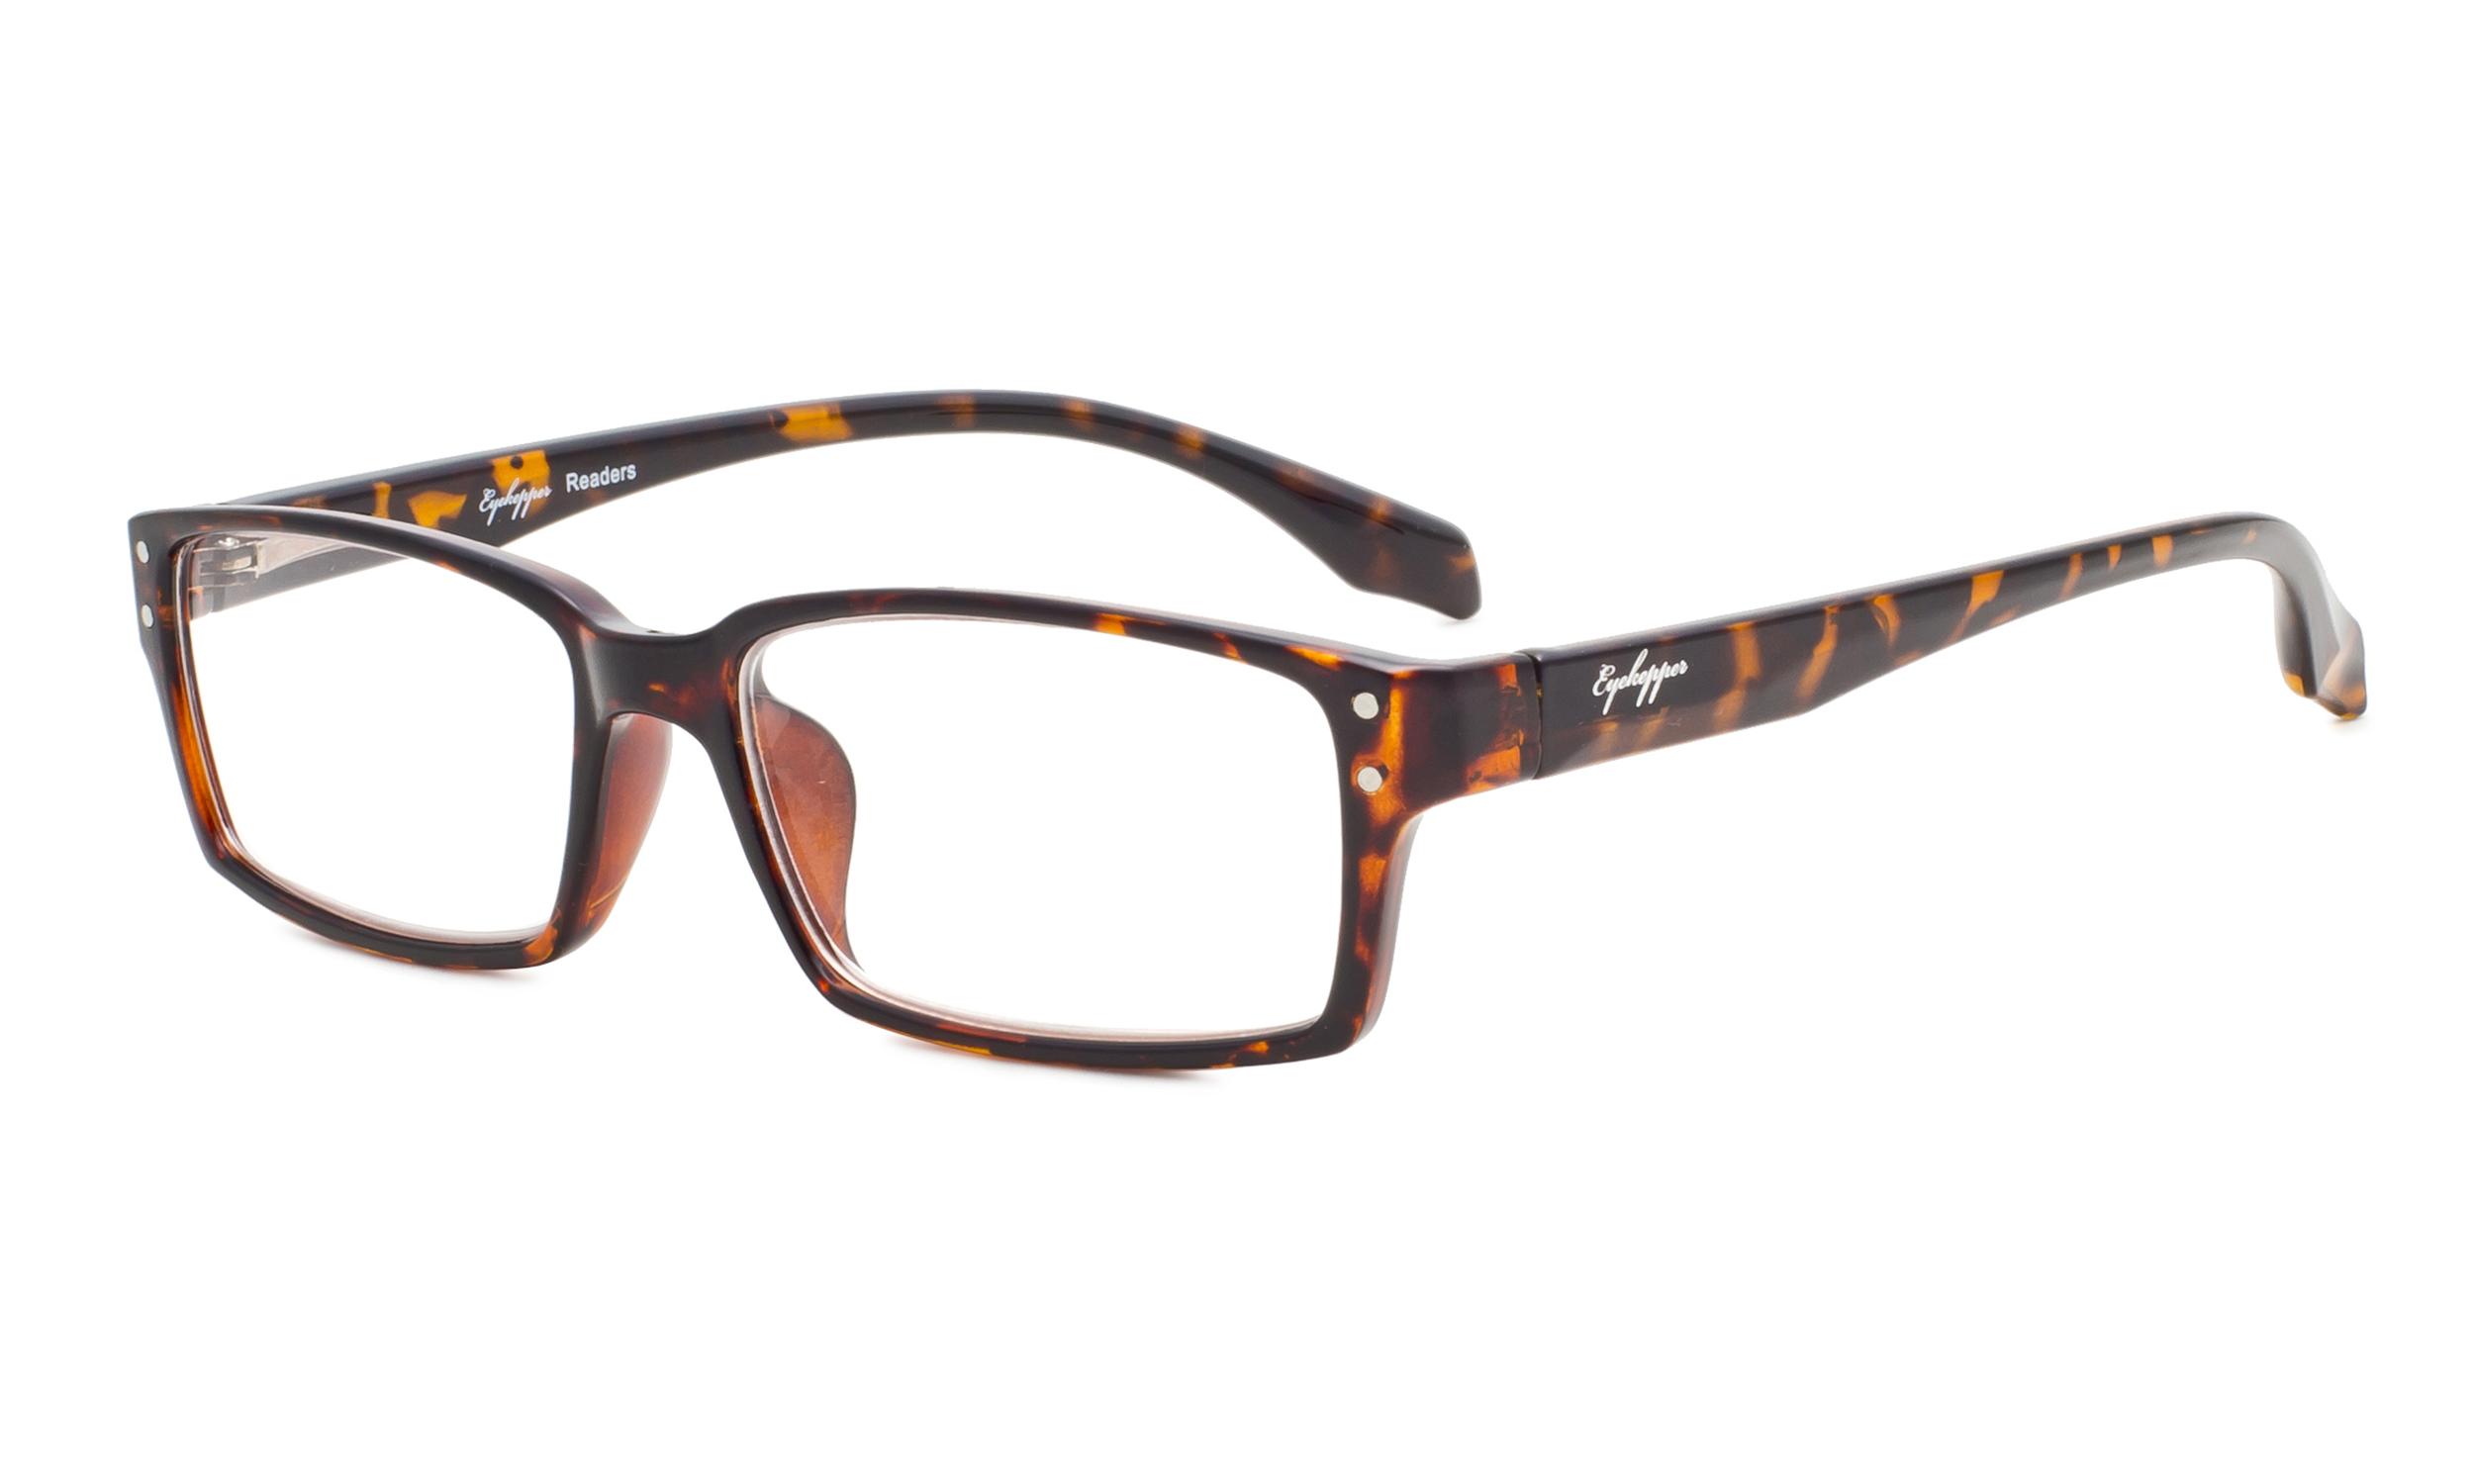 0d7a127978c21 Eyekepper Reading Glasses Classic rectangle Full Frame with Spring-Hinges  Classic Readers Women Men Tortoise R096